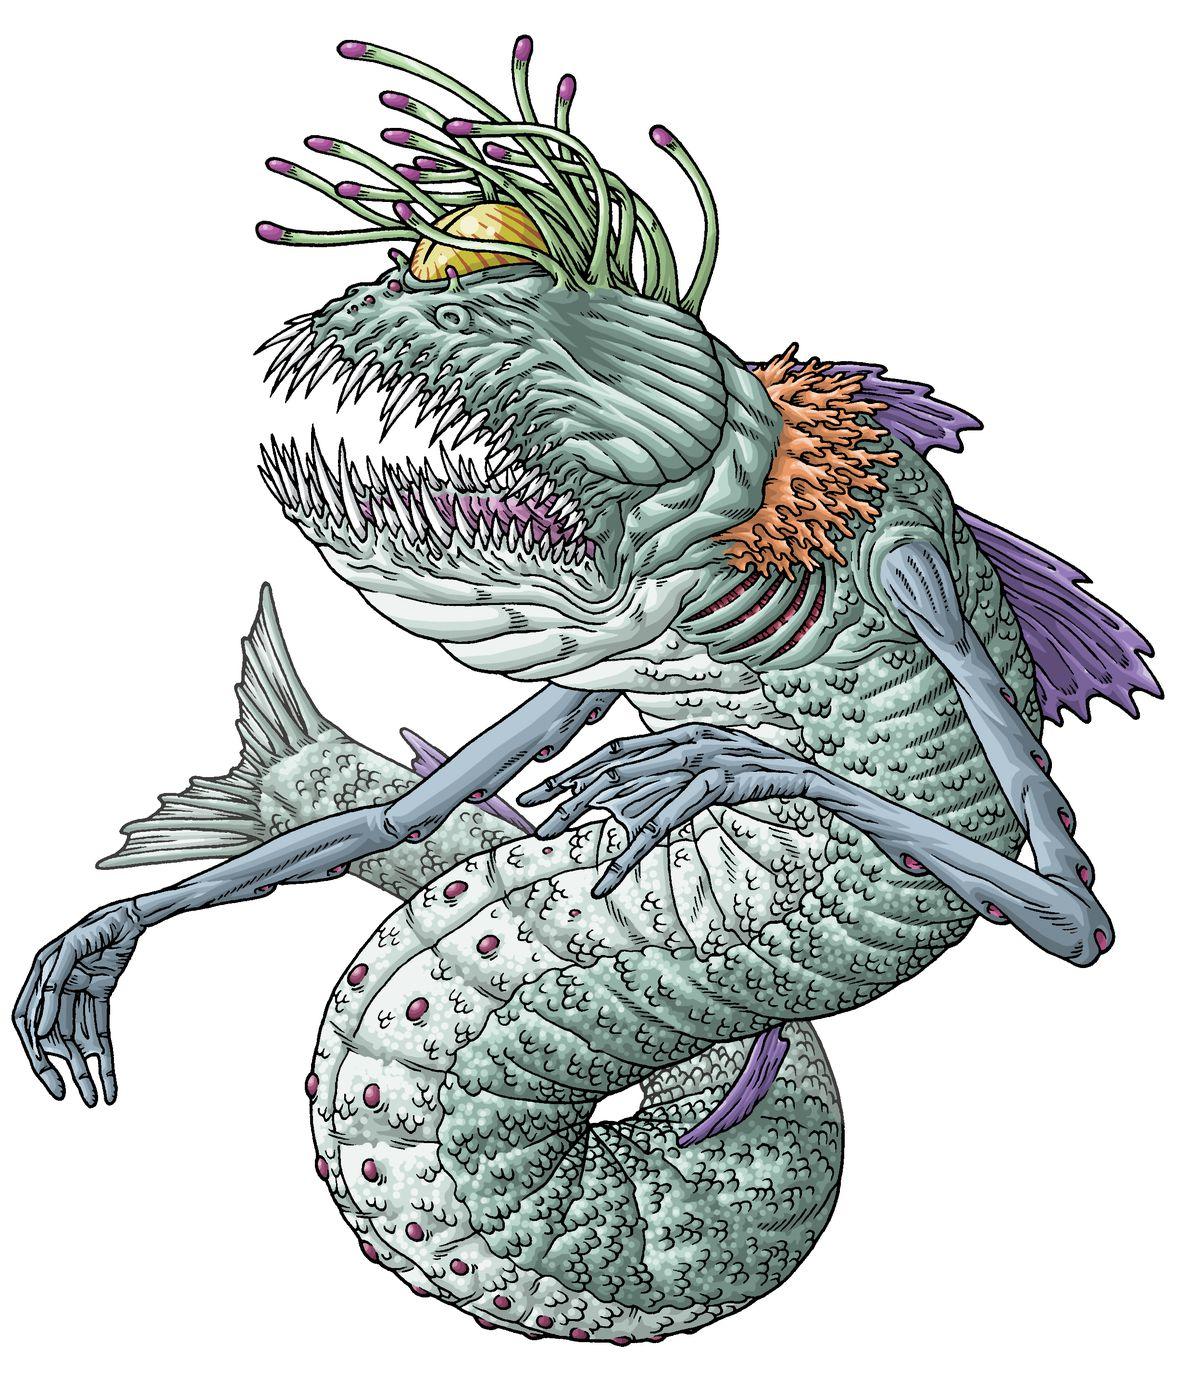 HP Lovecraft's Dagon